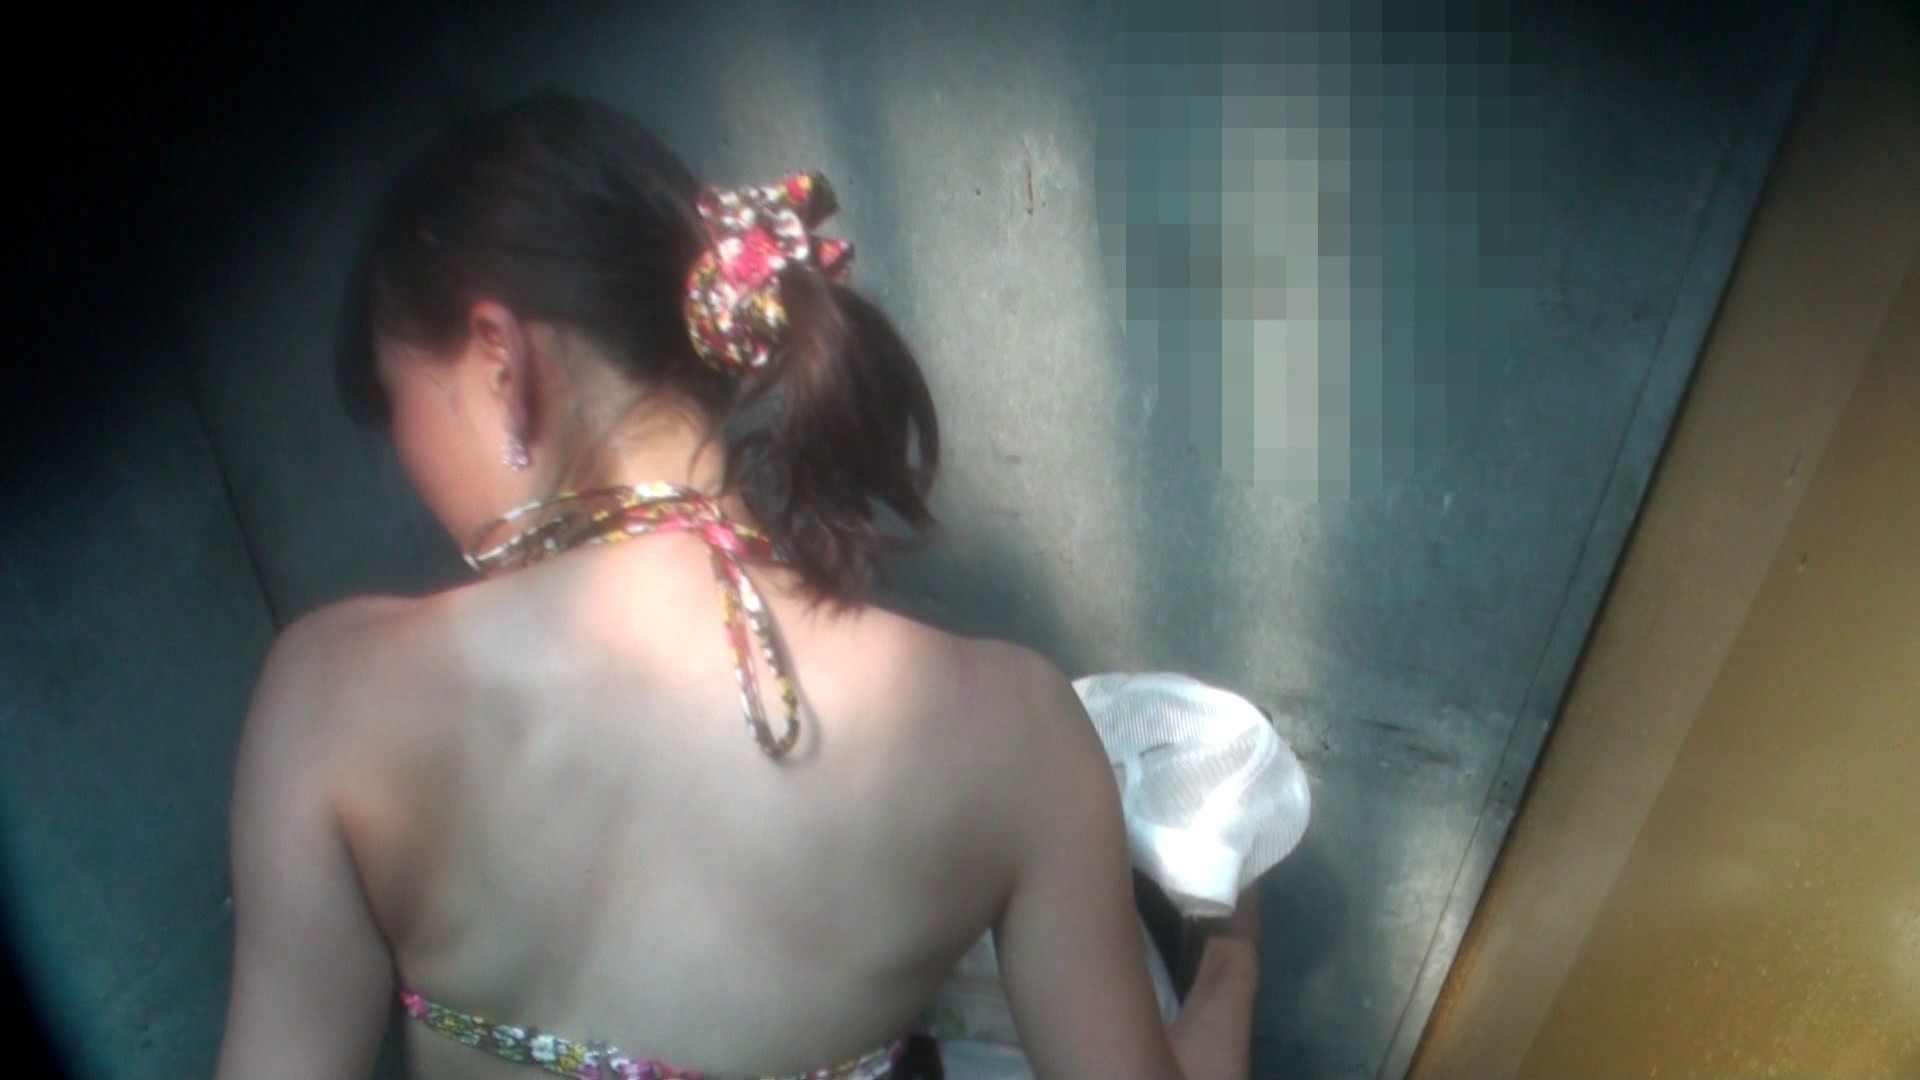 Vol.16 意外に乳首は年増のそれ 細身体型 AV無料動画キャプチャ 105枚 17